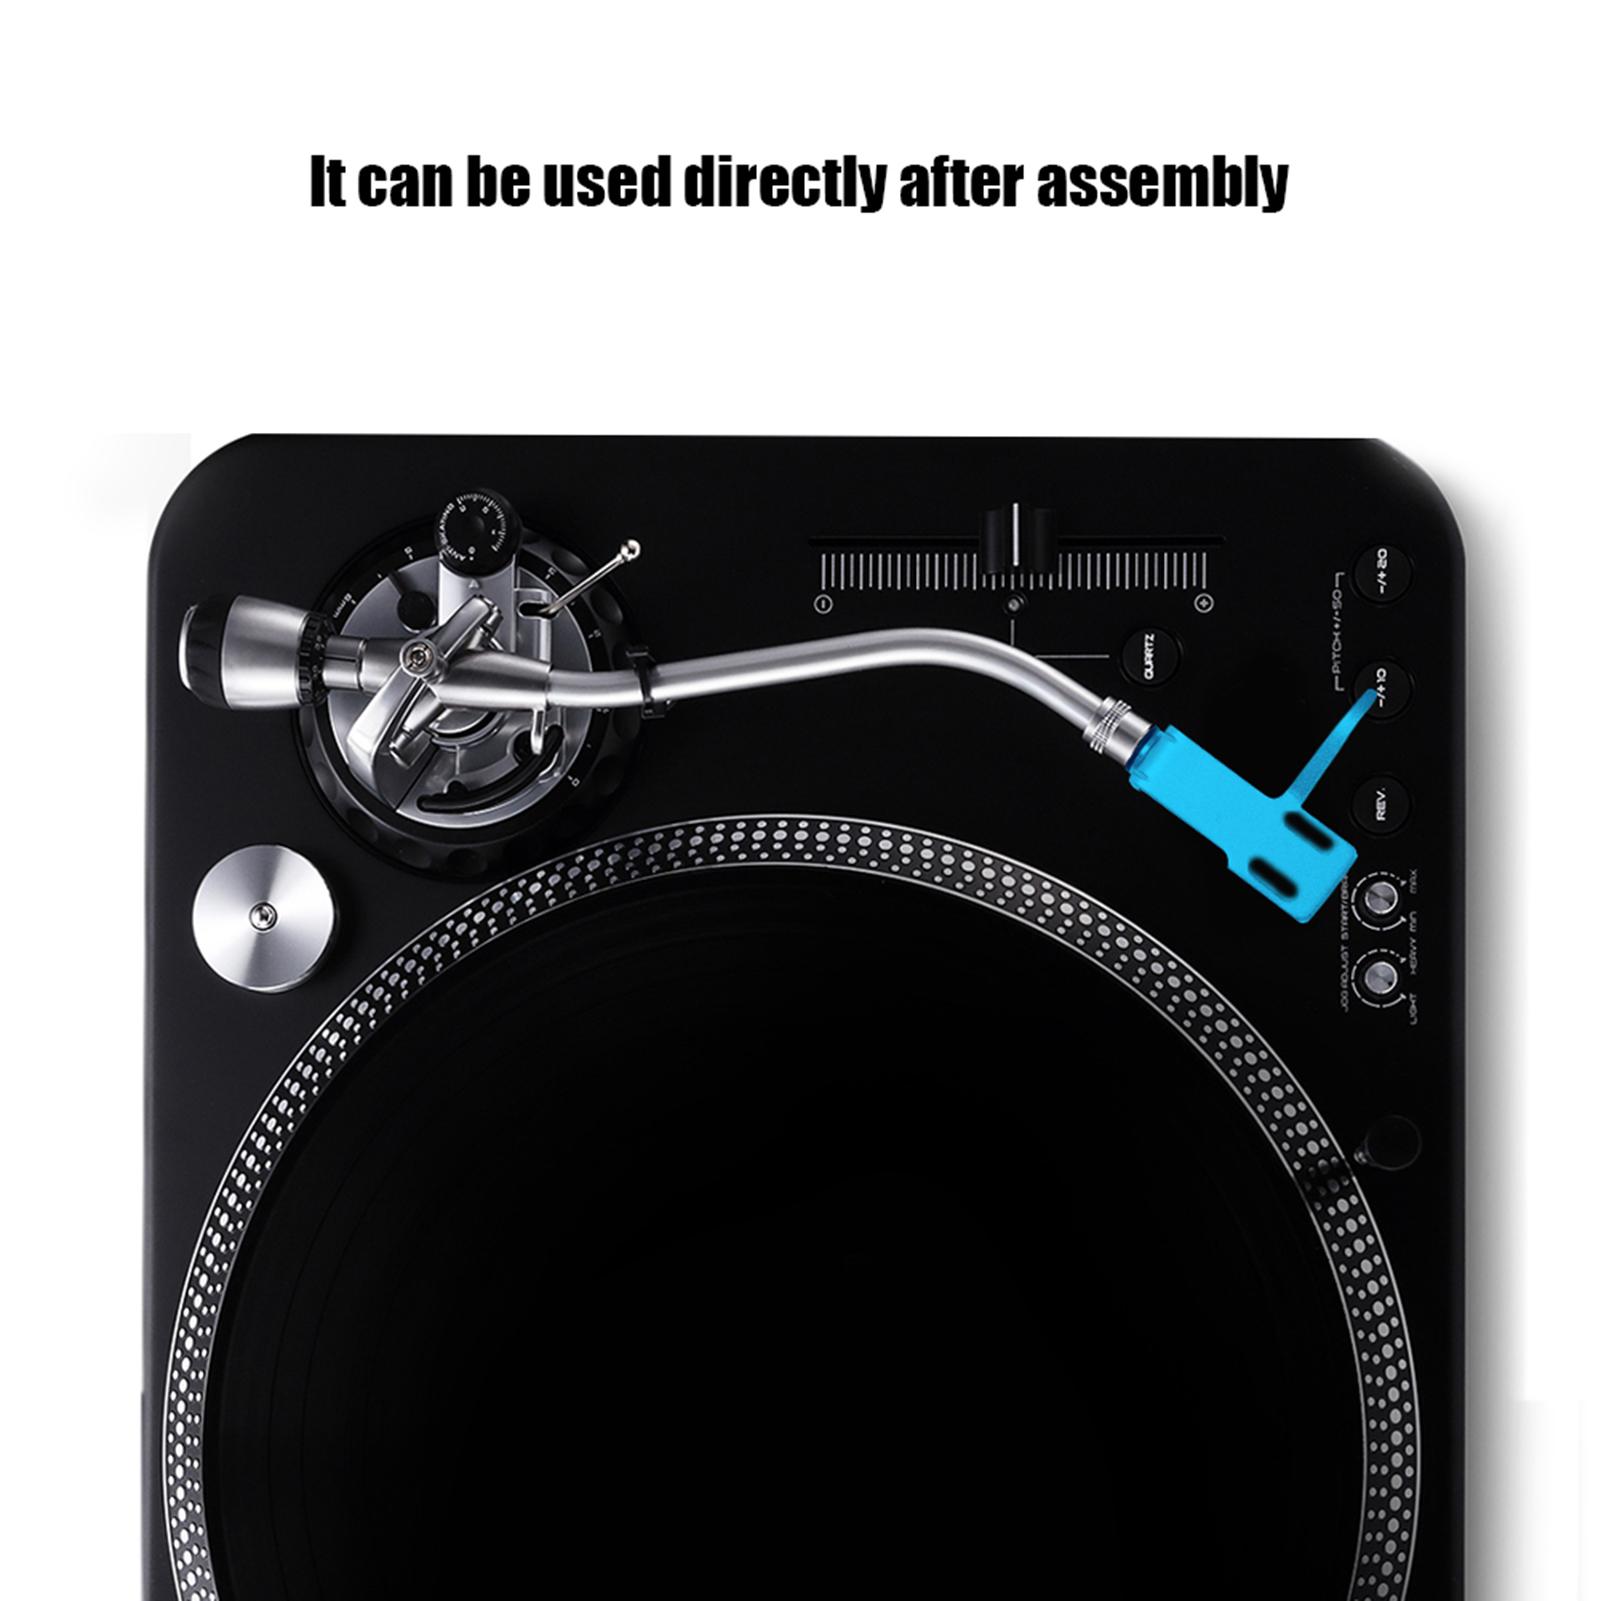 Universal-Phono-Stylus-Holder-Headshell-Cartridge-Keeper-for-LP-Record-Player thumbnail 23